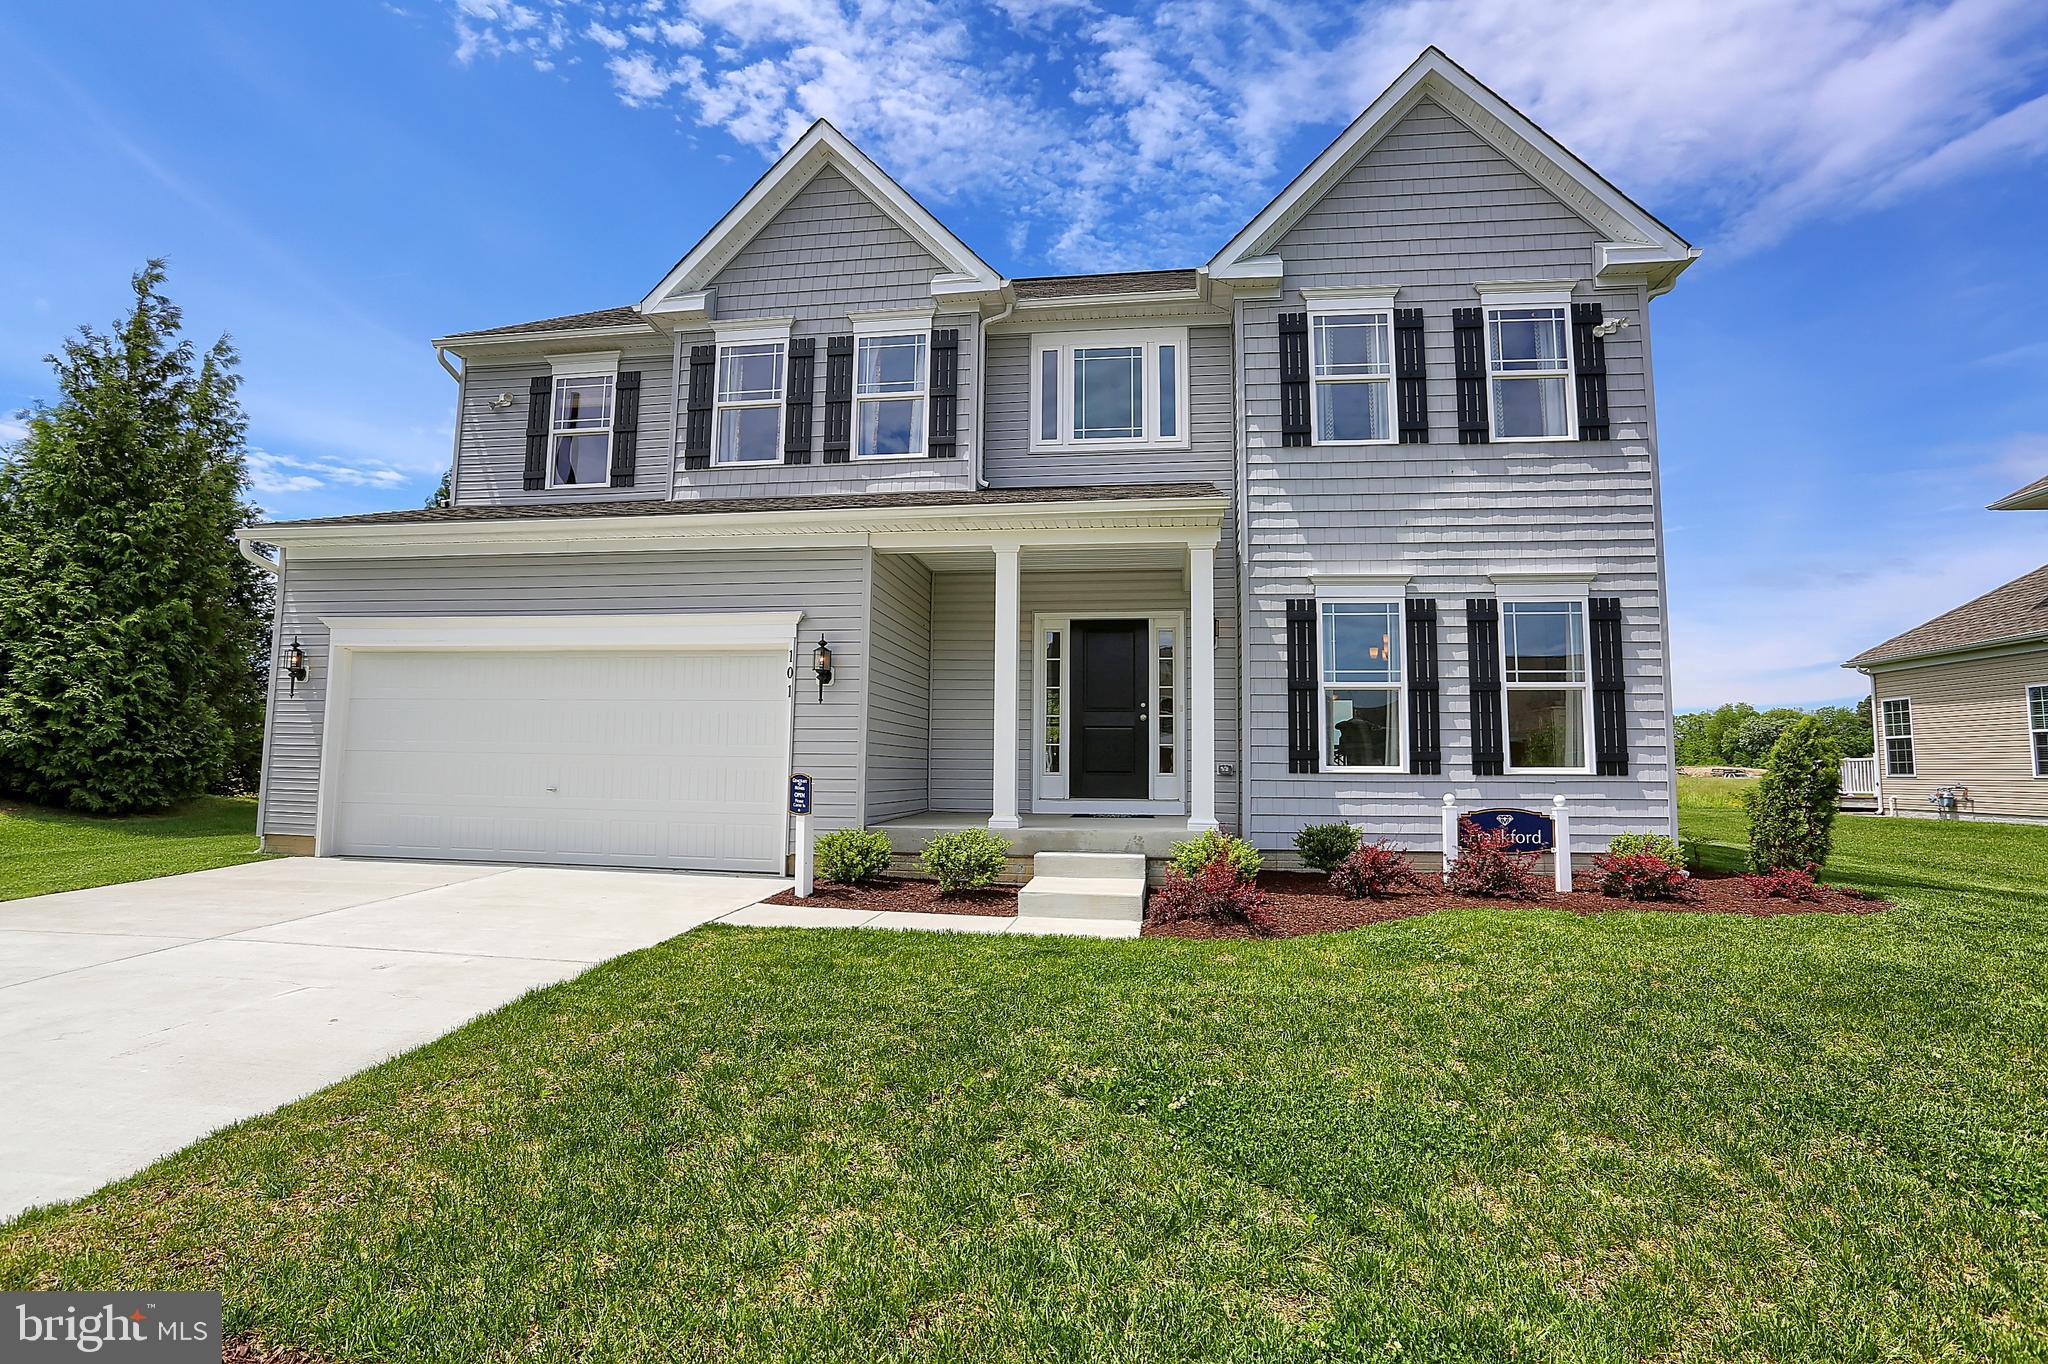 Similar home shown- Elevation B